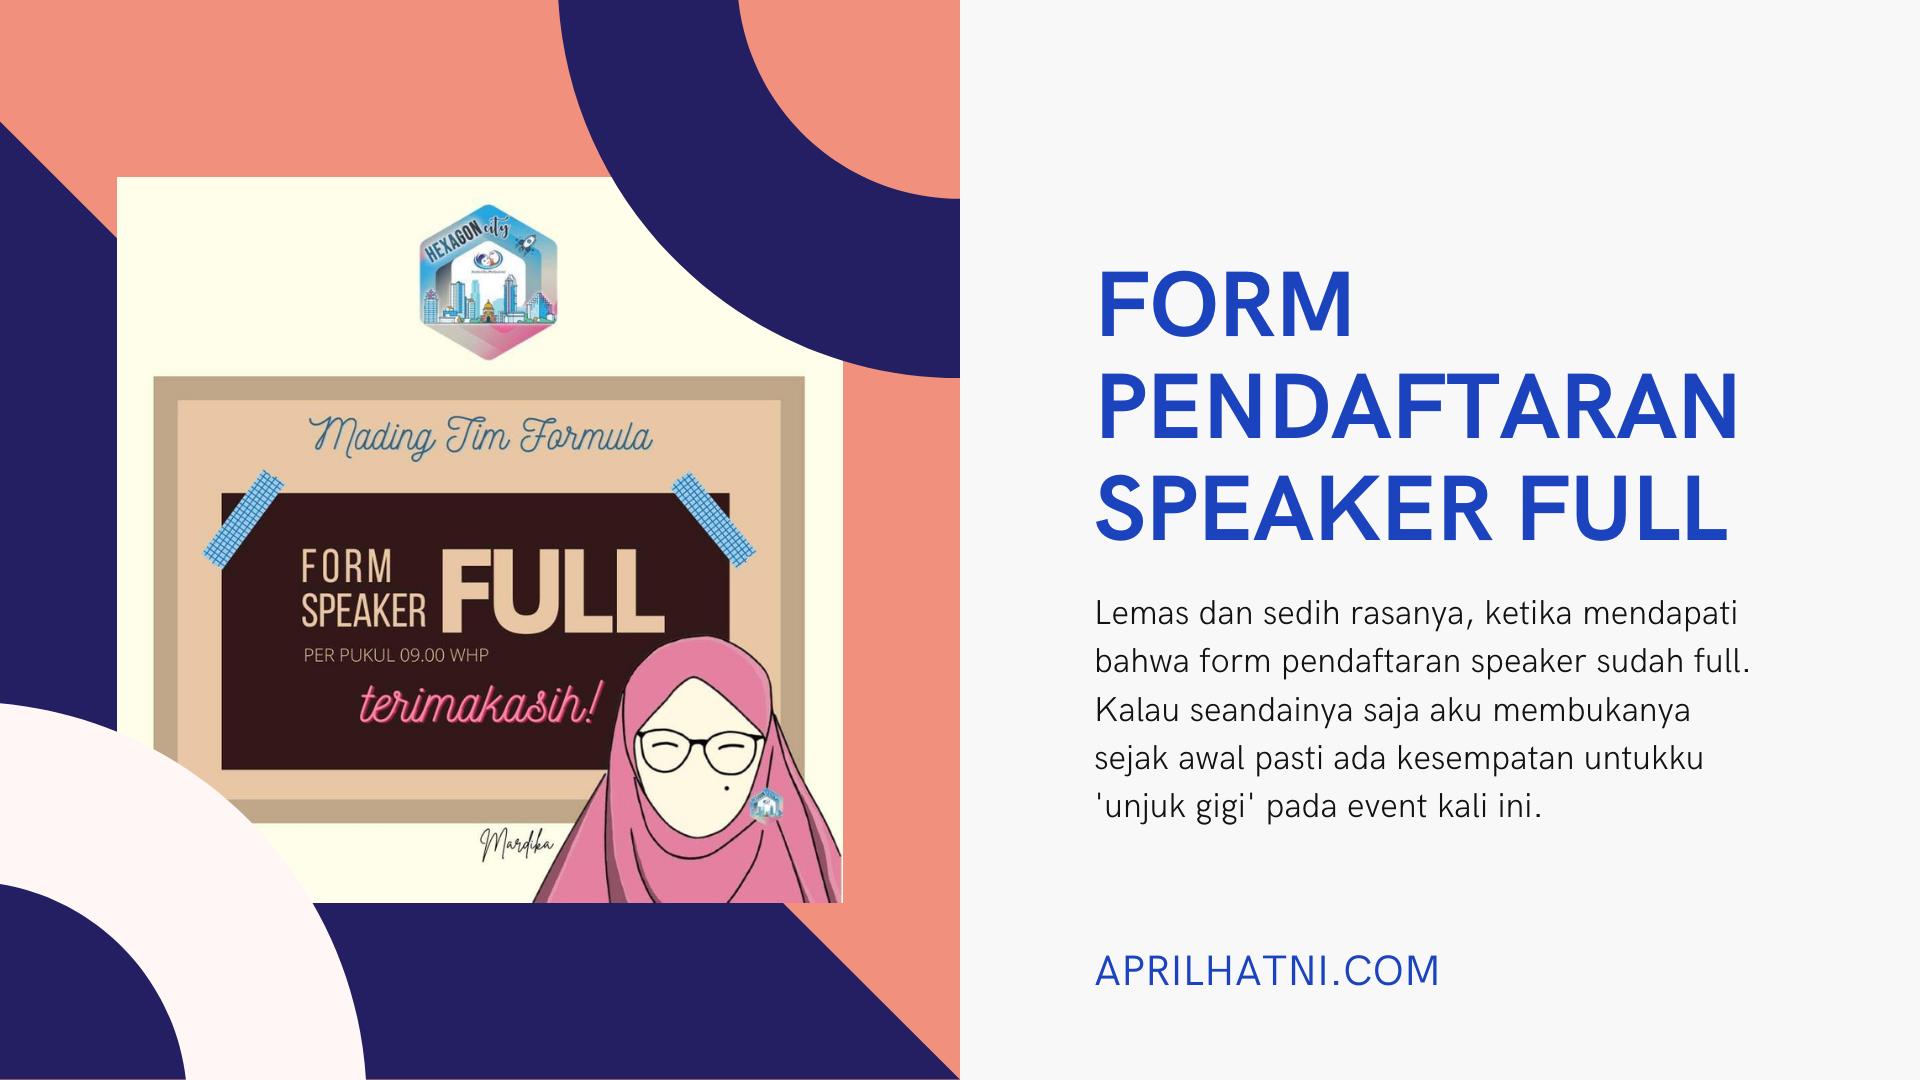 form pendaftaran speaker